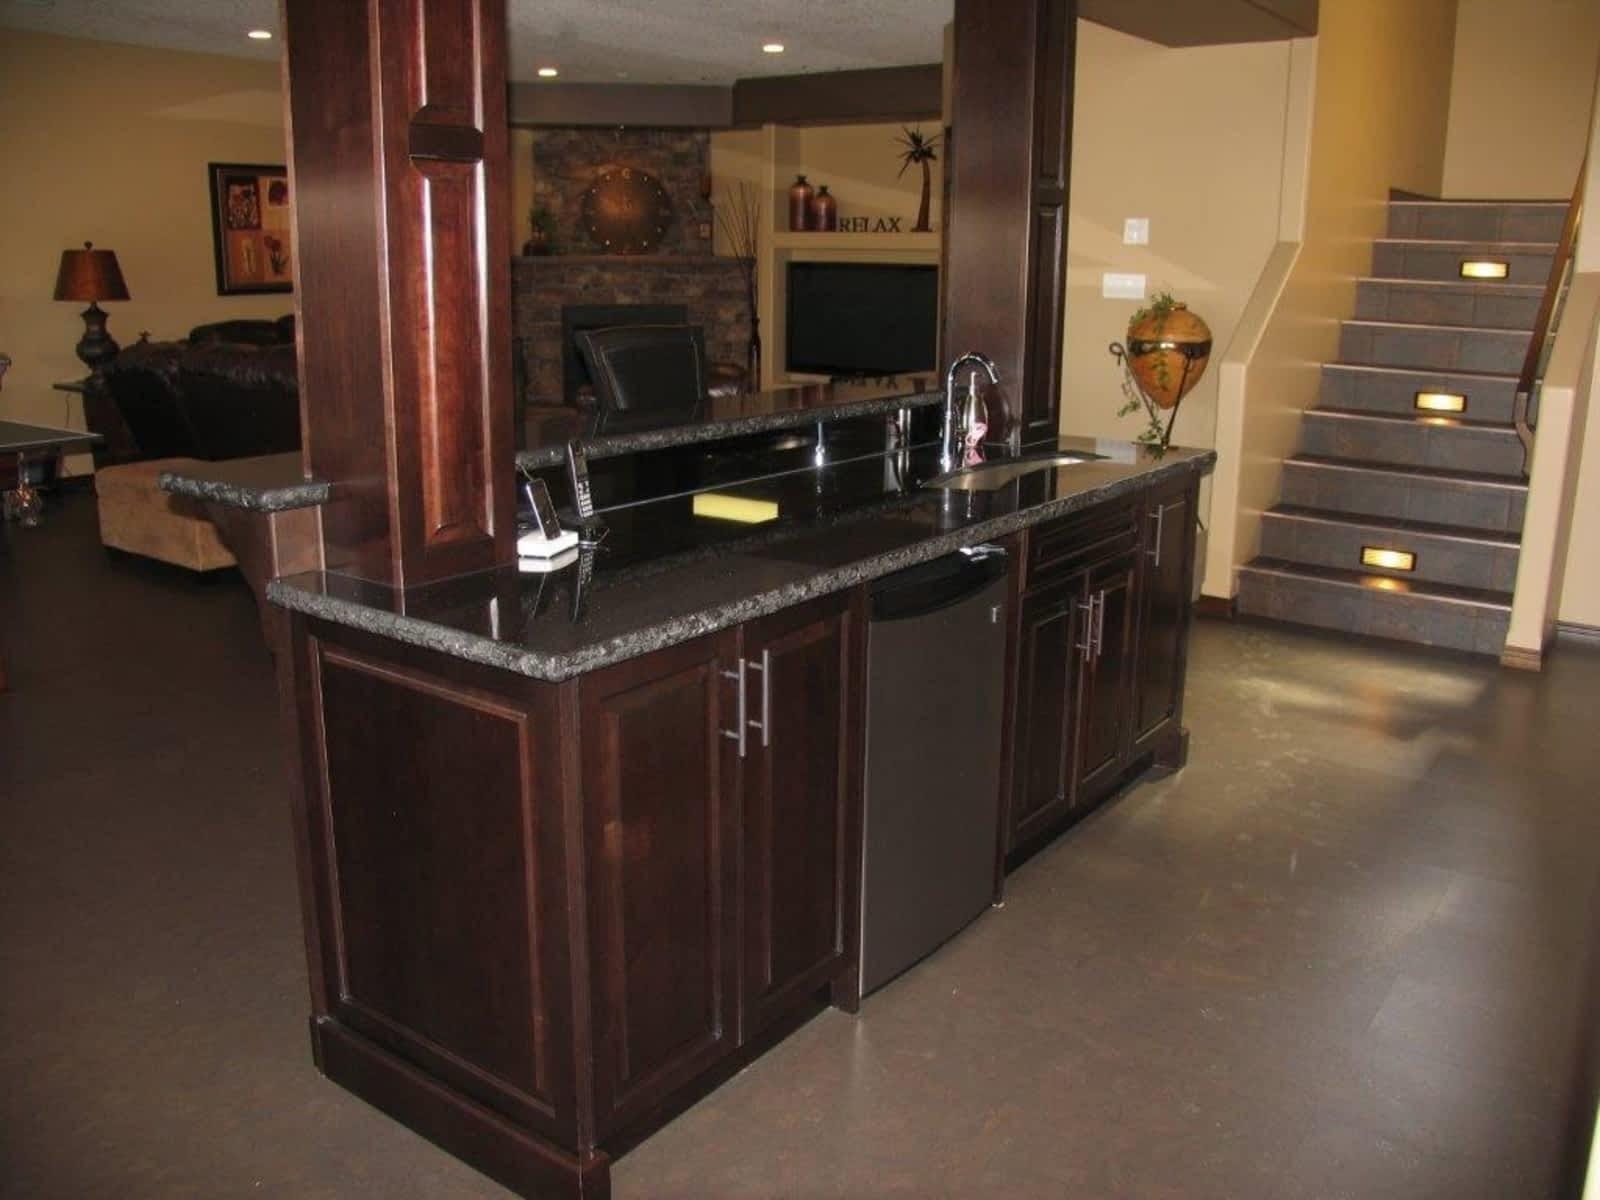 creative kitchens opening hours po box 628 killarney mb